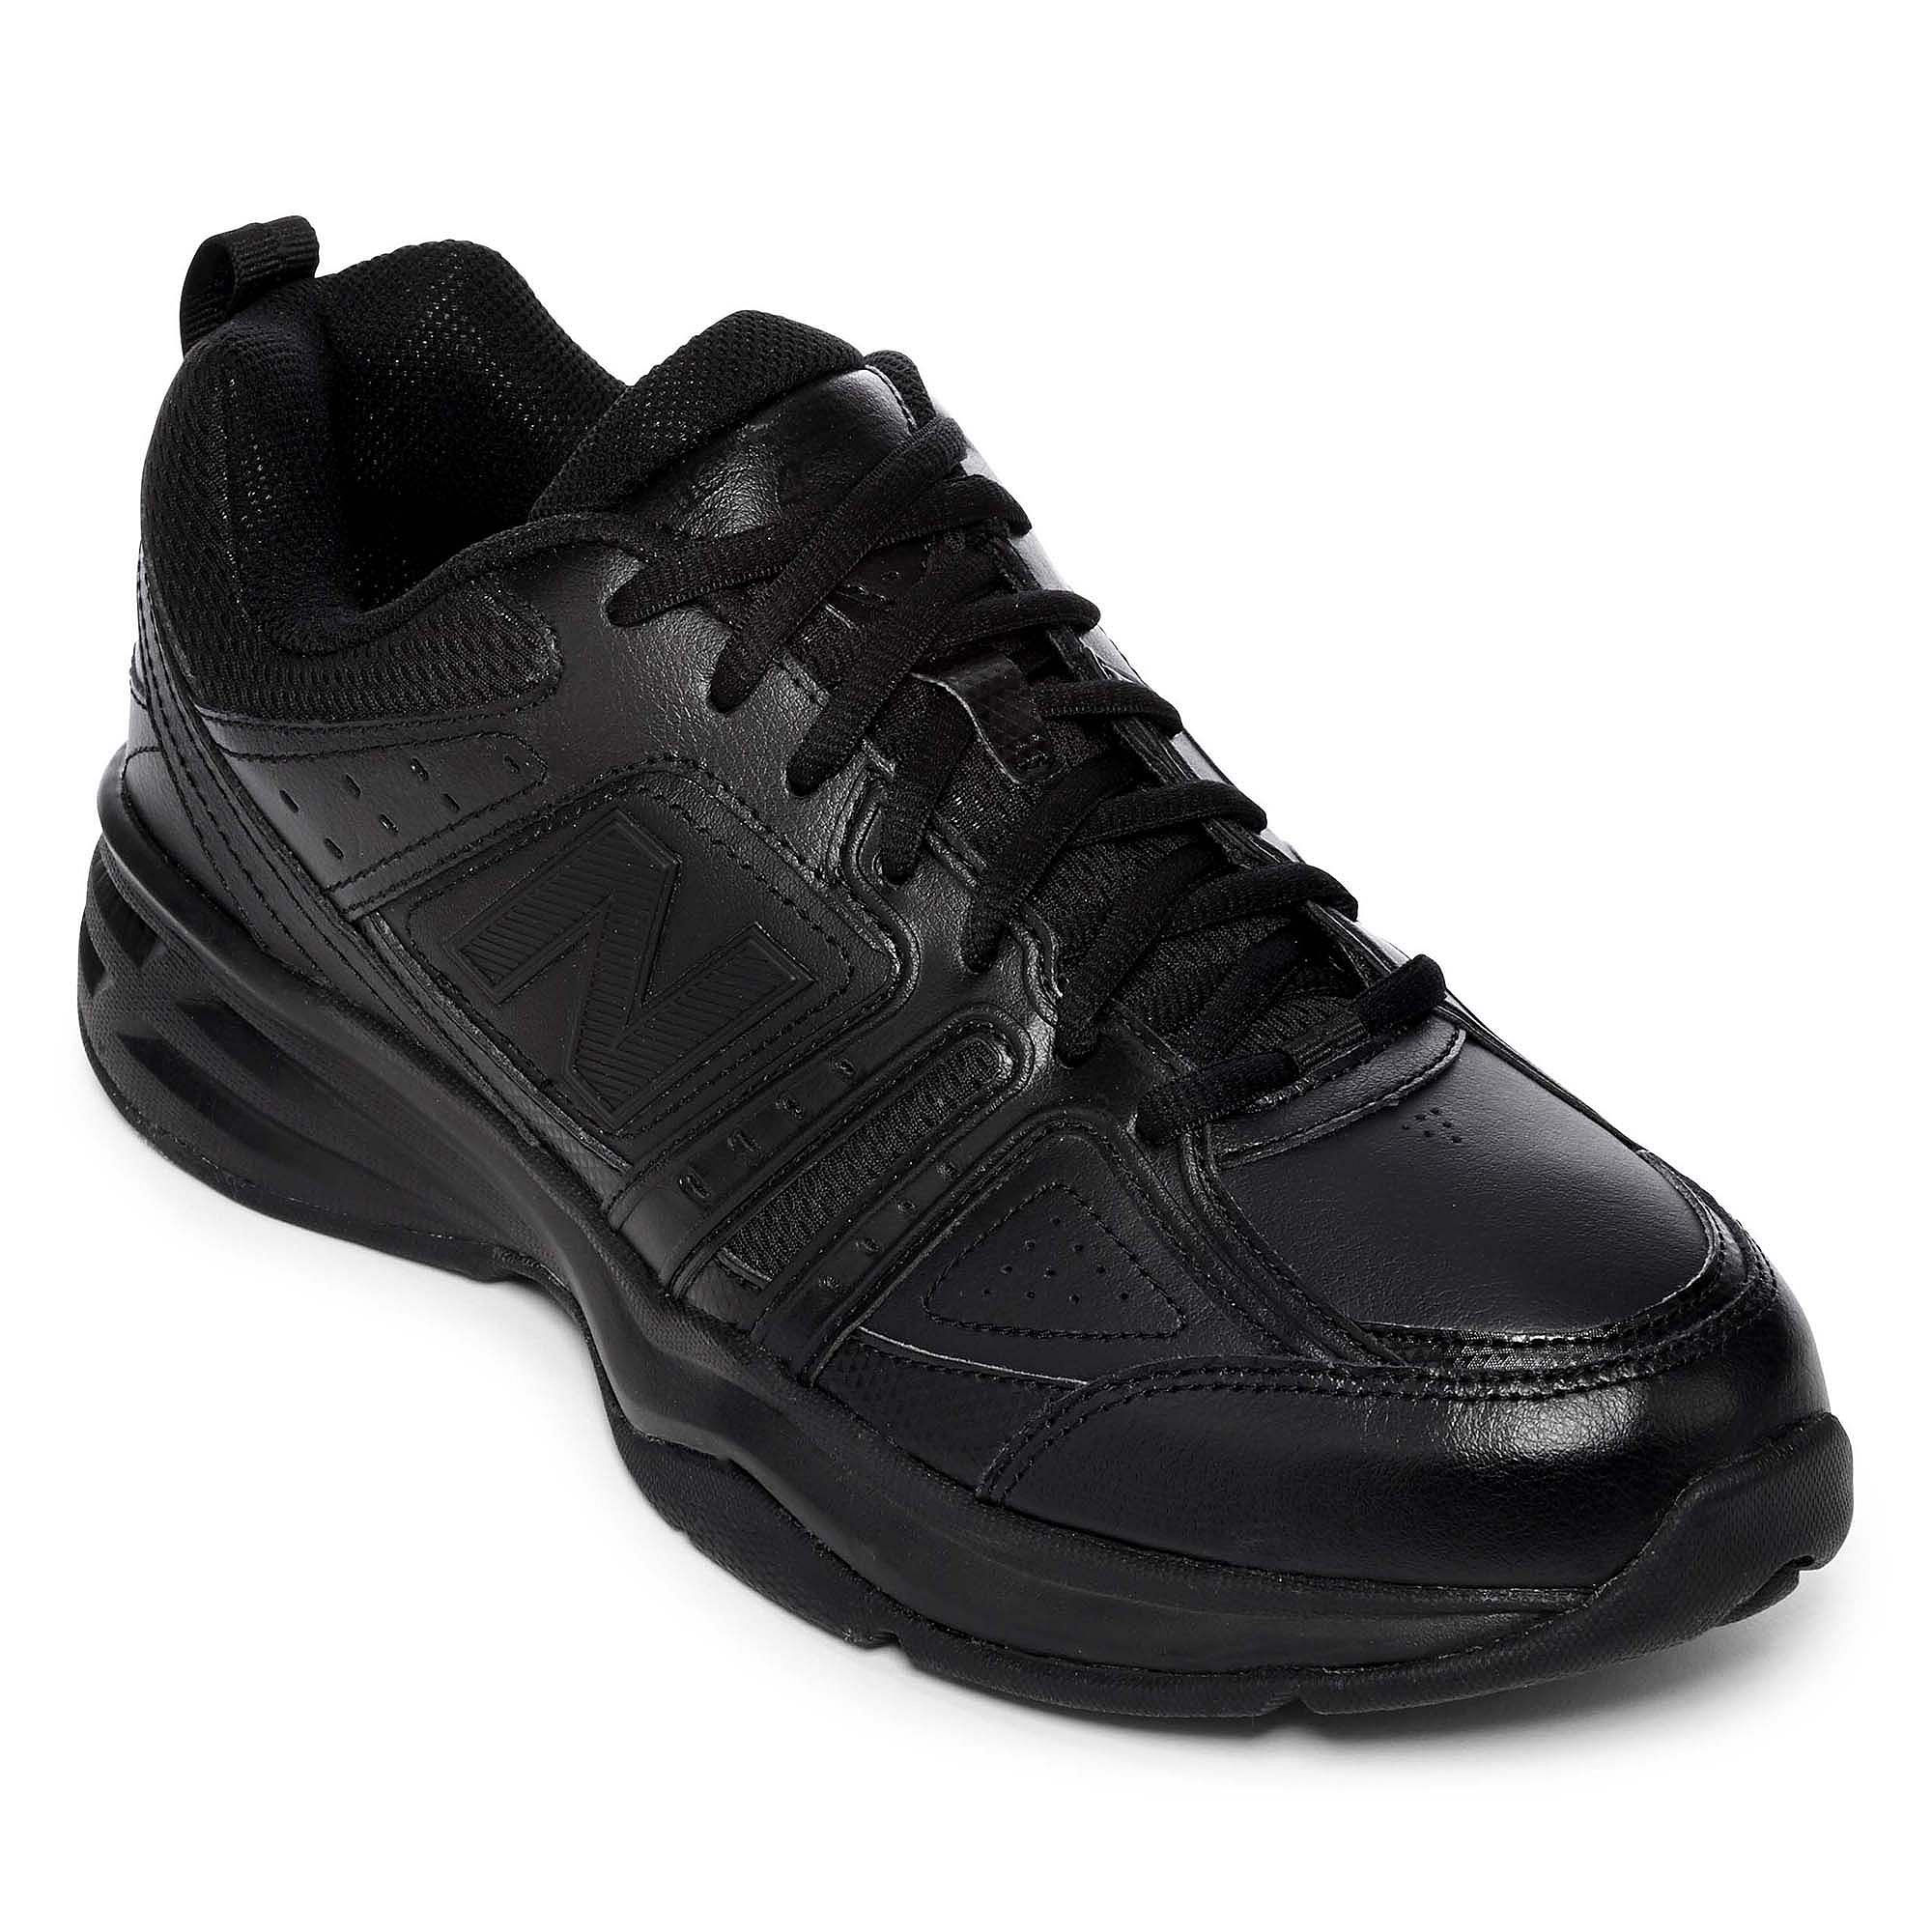 UPC 886863805262 product image for New Balance 409 Mens Training Shoes   upcitemdbcom